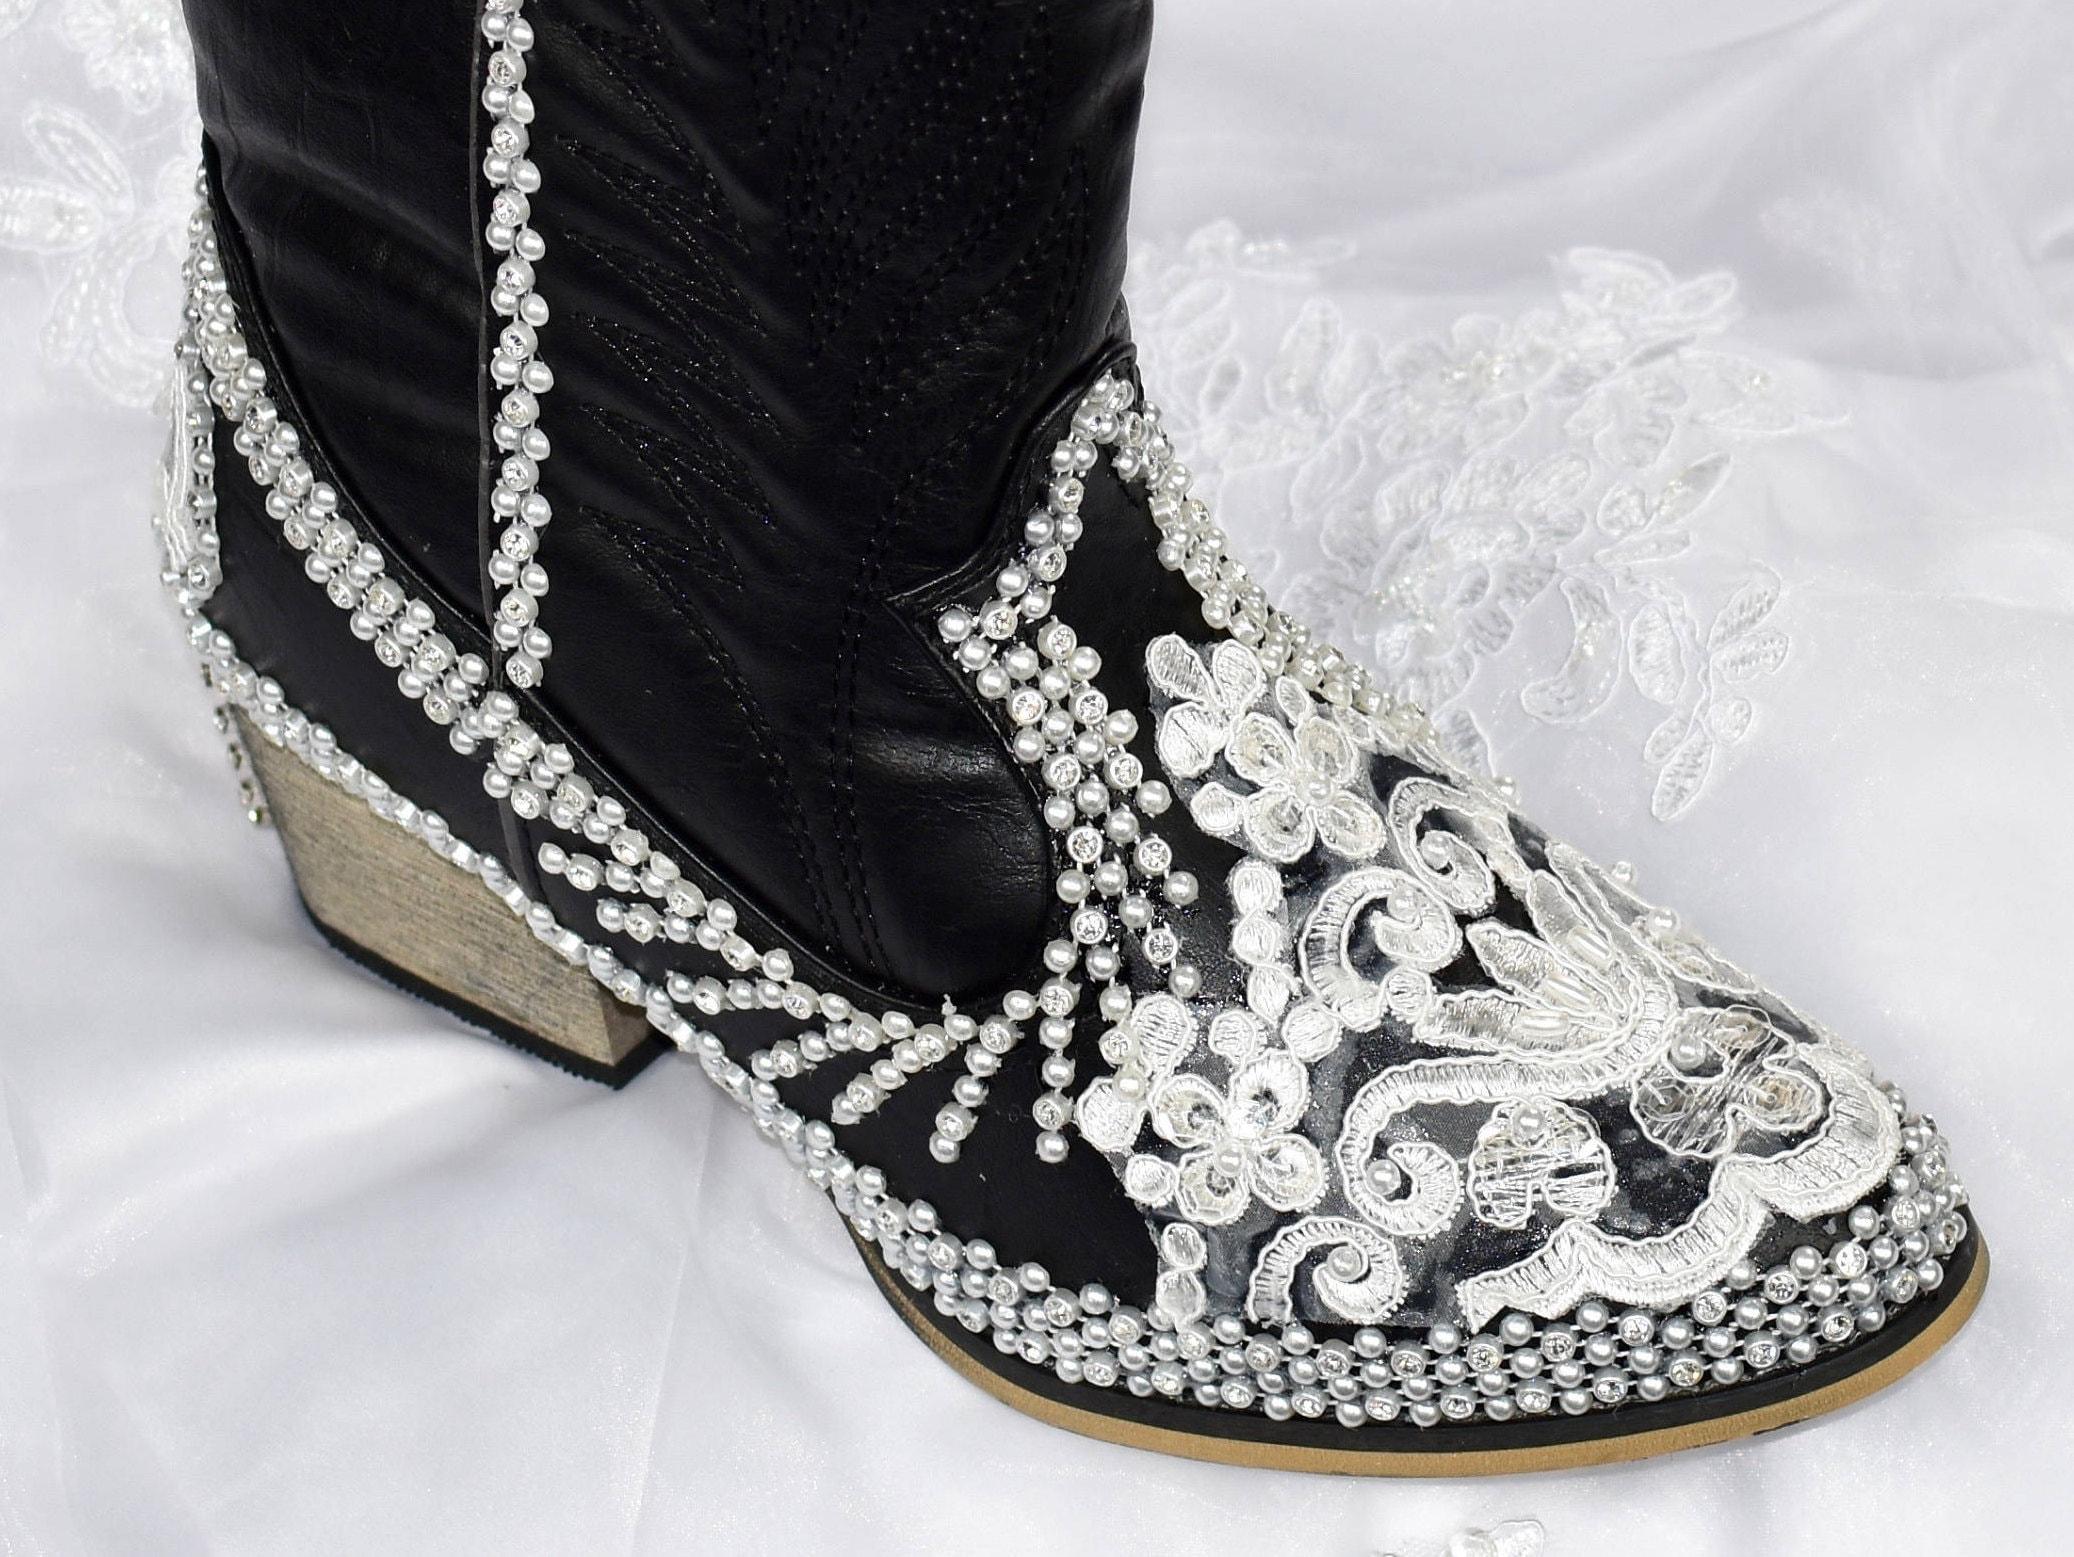 Black Wedding Bridal Cowboy Boots. Wedding Bridal Black Shoes ...